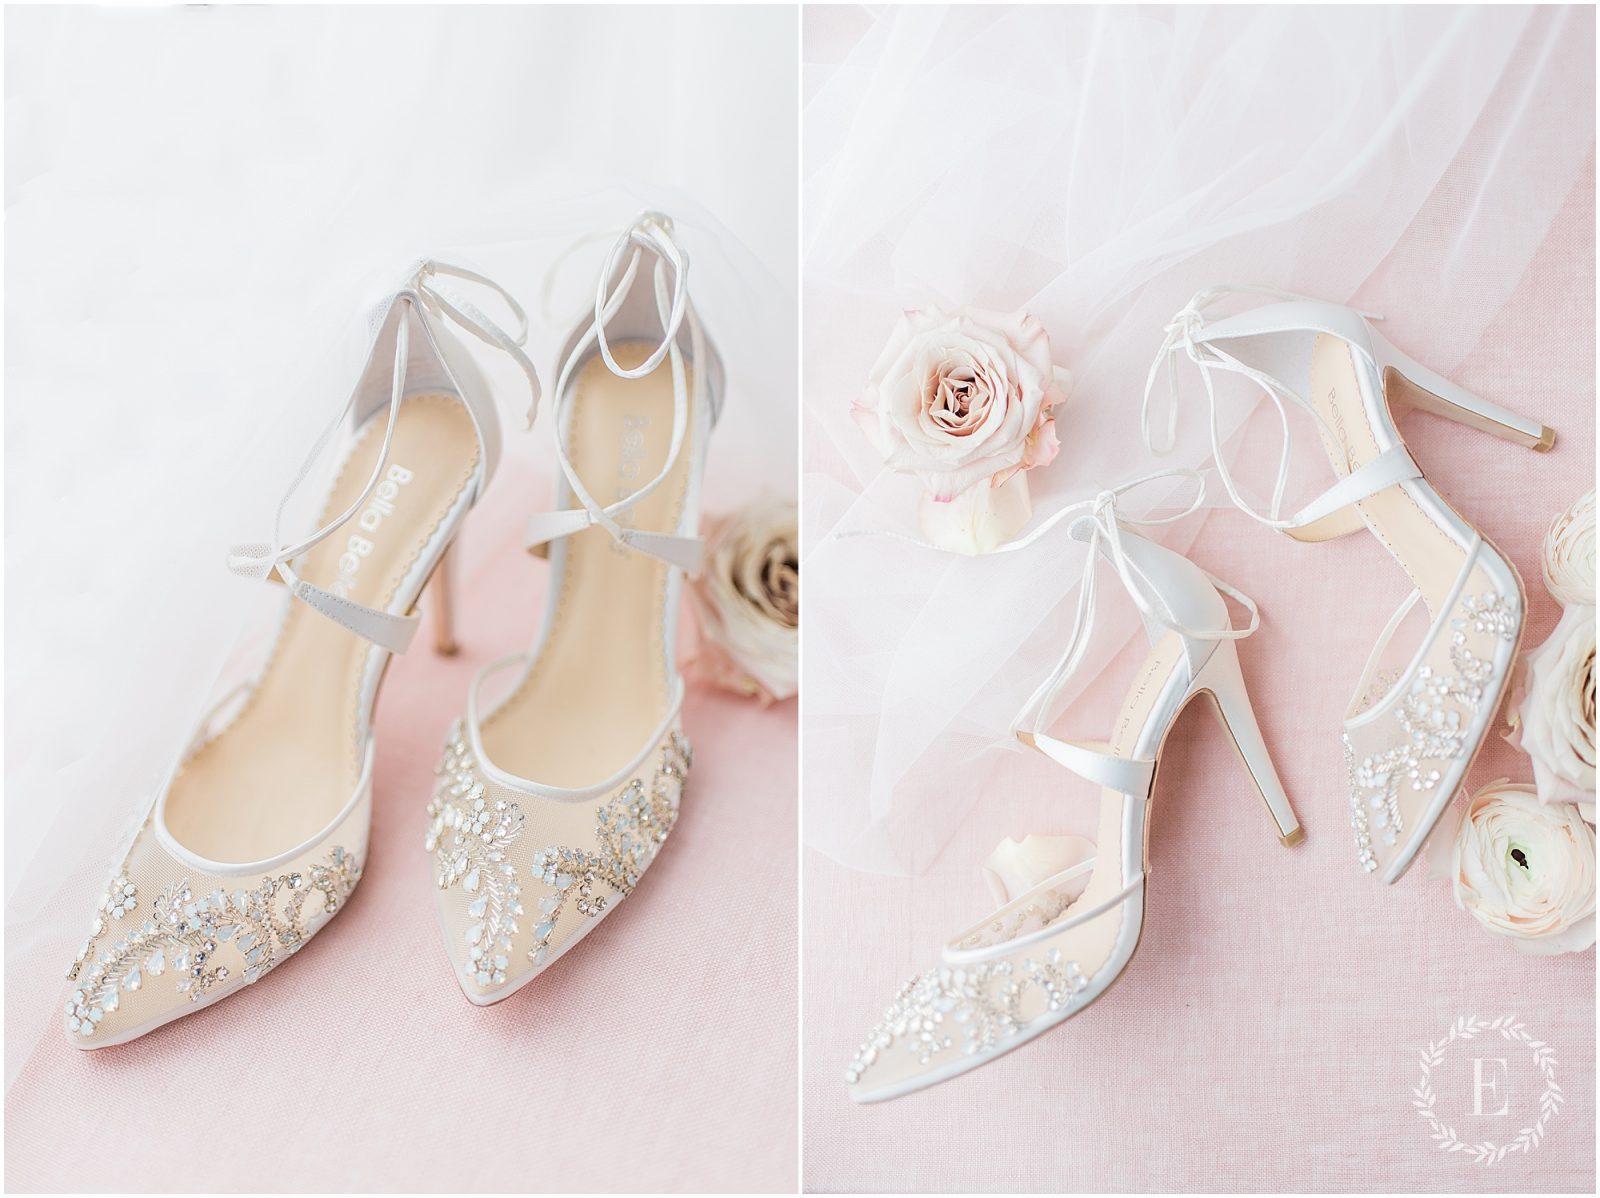 40 - Bella Belle for Fairy Dreams Bridal - PhotosbyEmmaH 2019.jpg